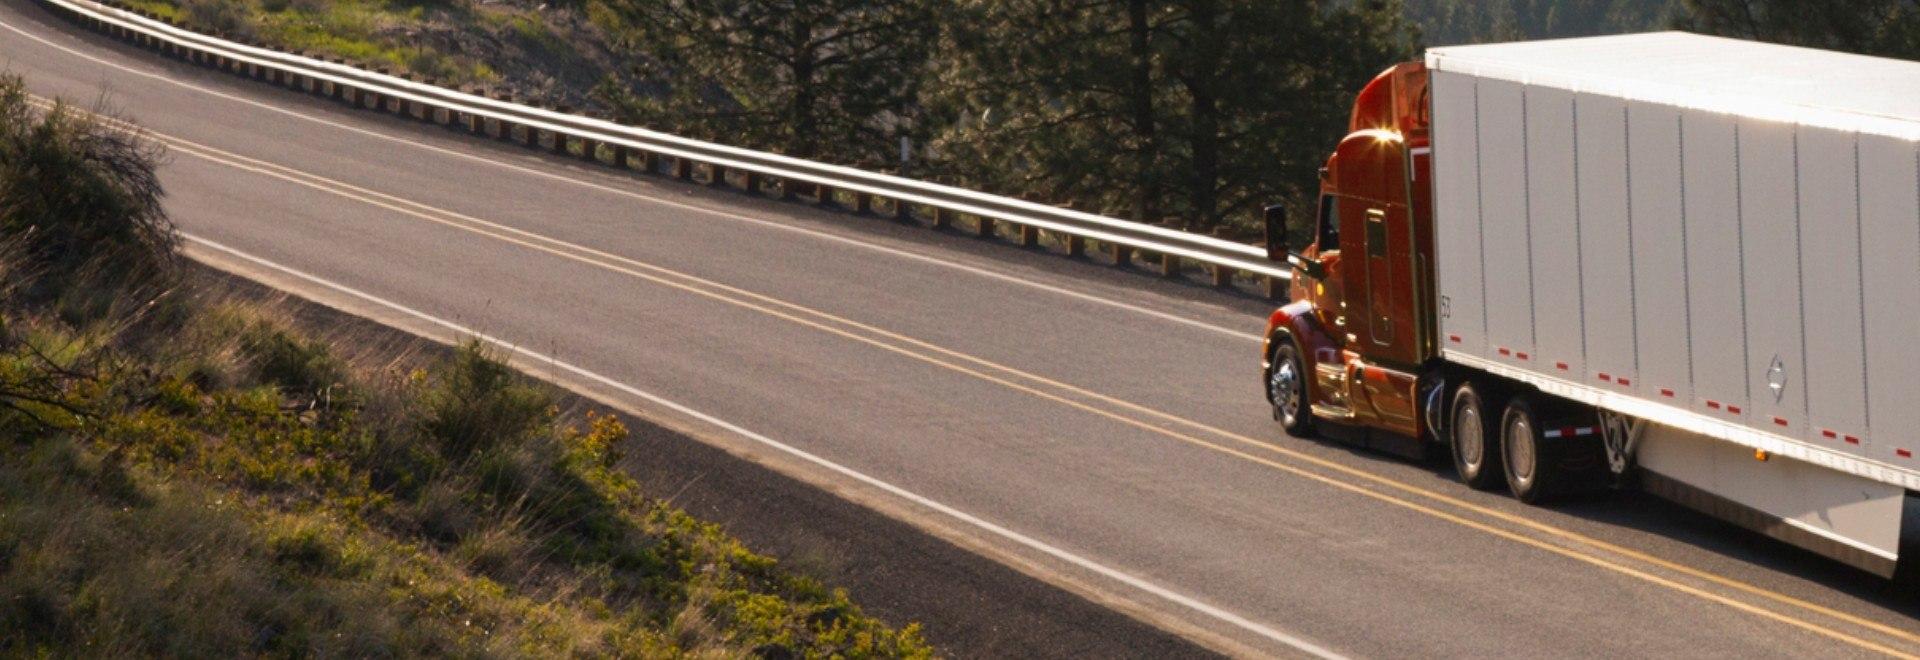 Giganti on the Road: USA